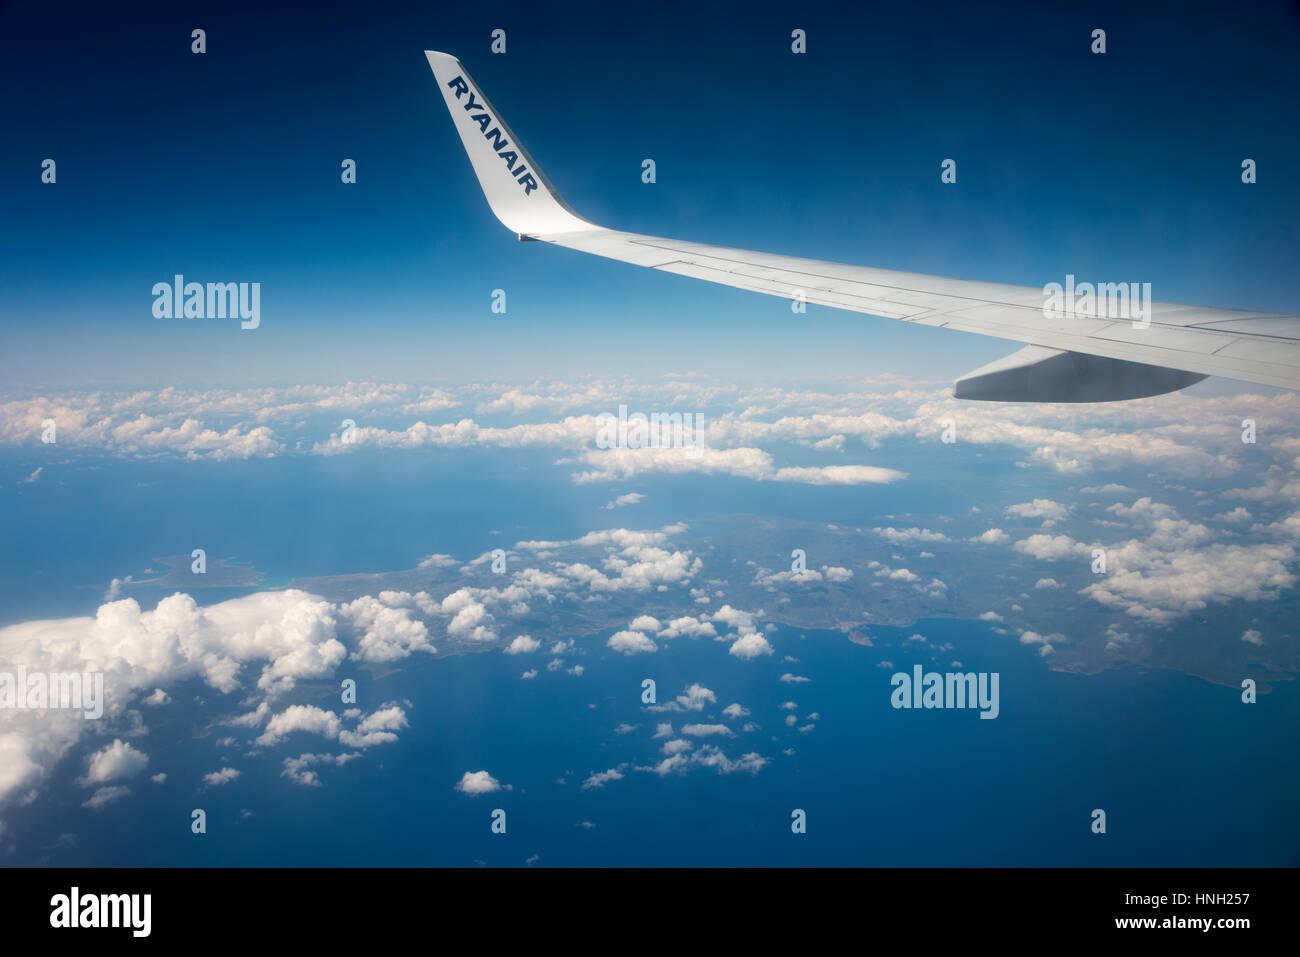 Airplane wing, Ryanair plane over Greece - Stock Image